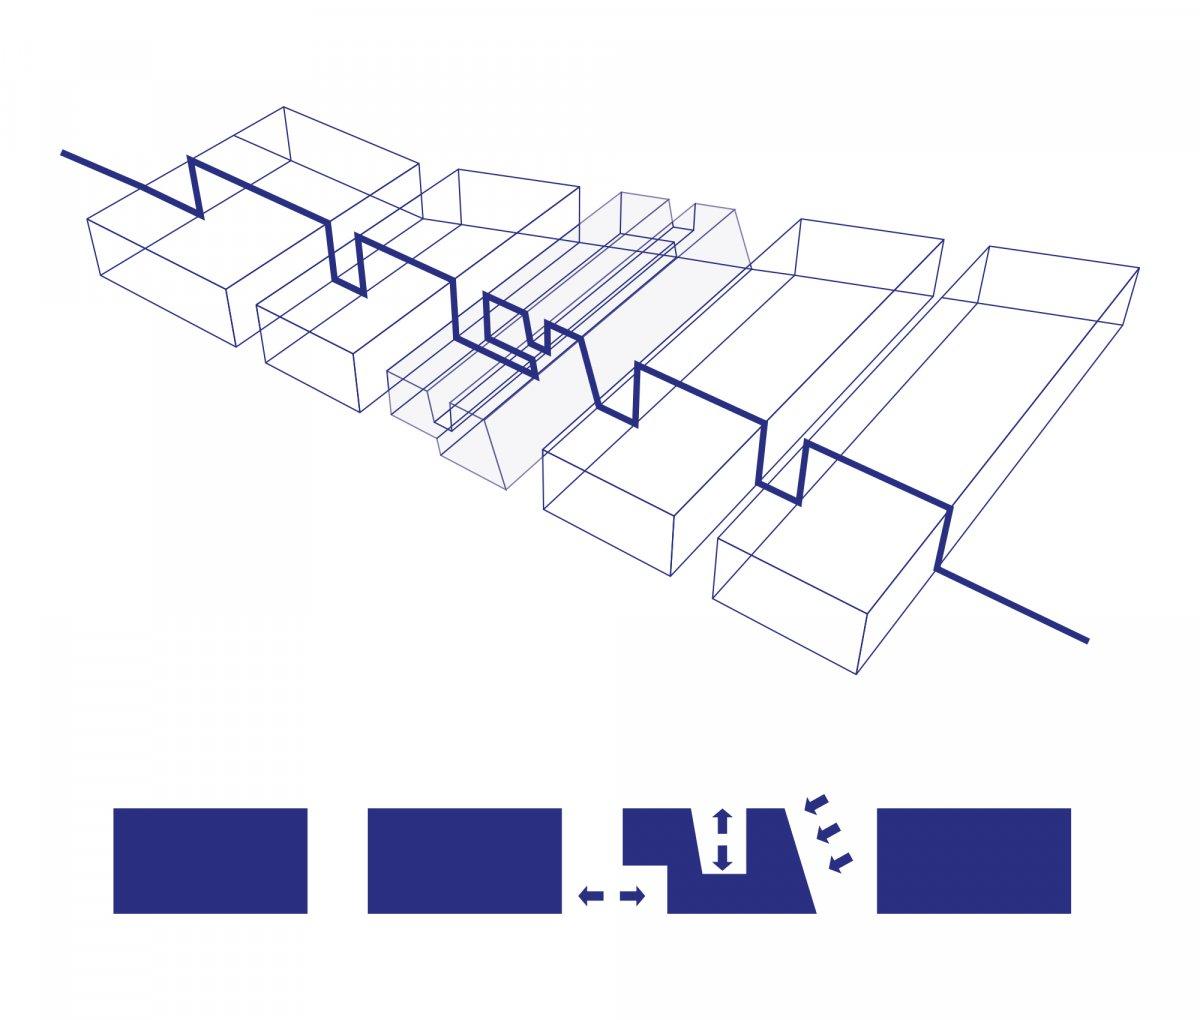 Diagram-urban condition